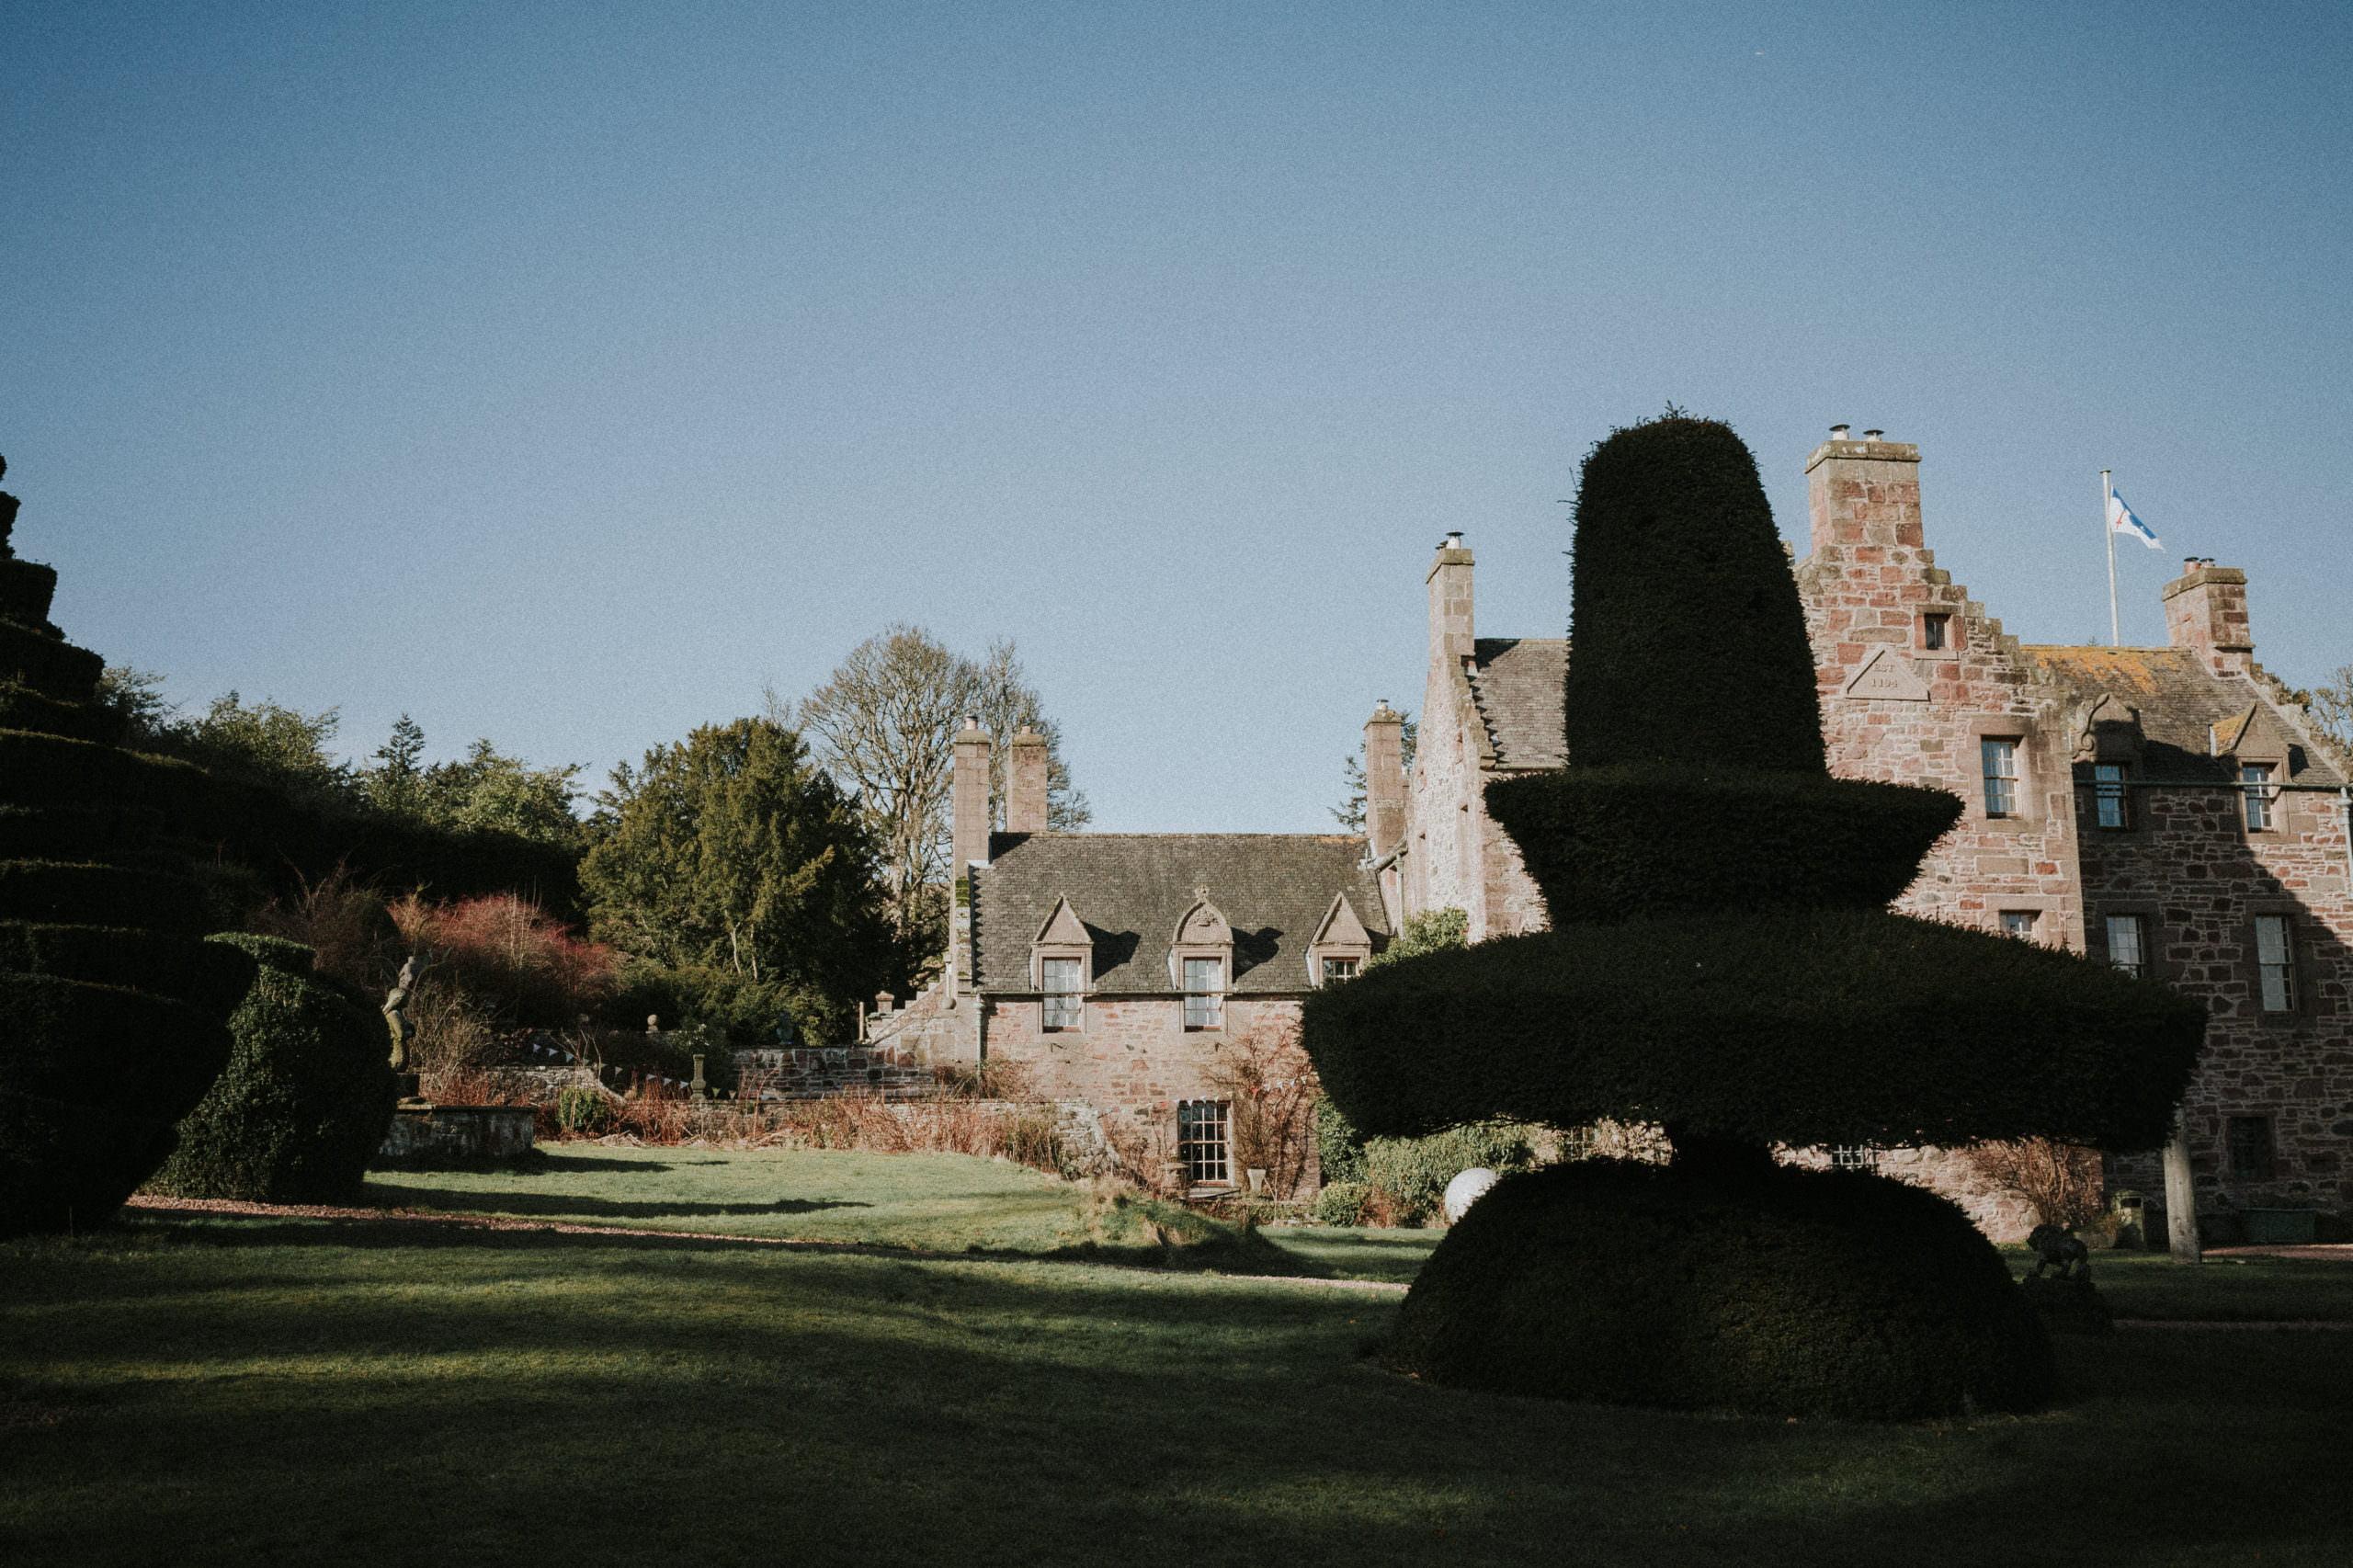 Wedding in Fingask Castle - Perthshire Castle Wedding Venues 1